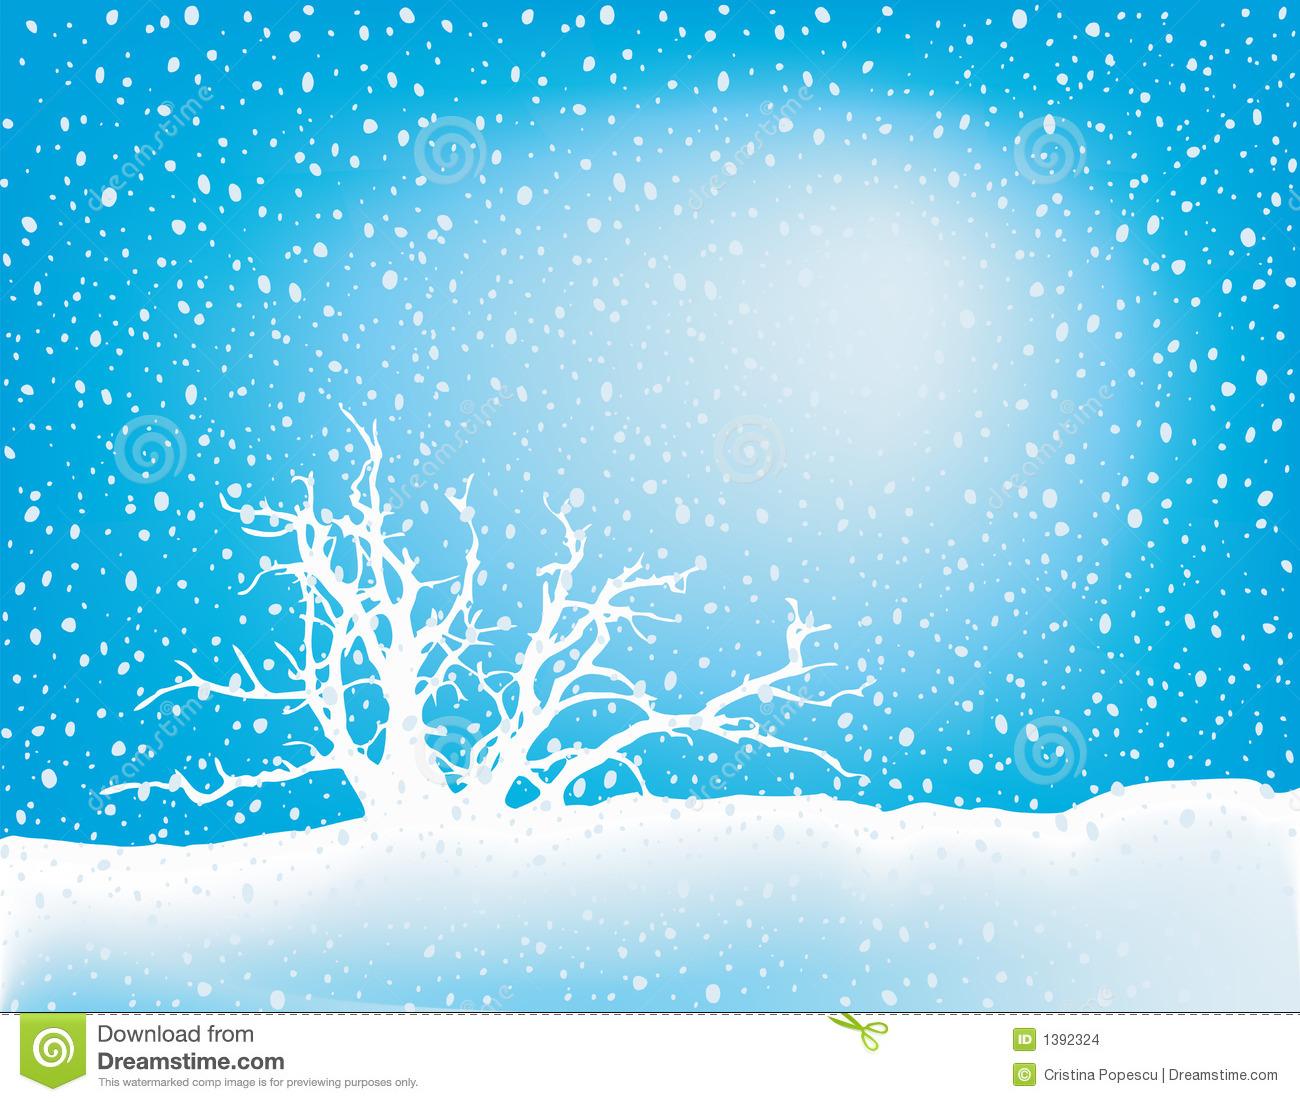 clipart snow scene - photo #29